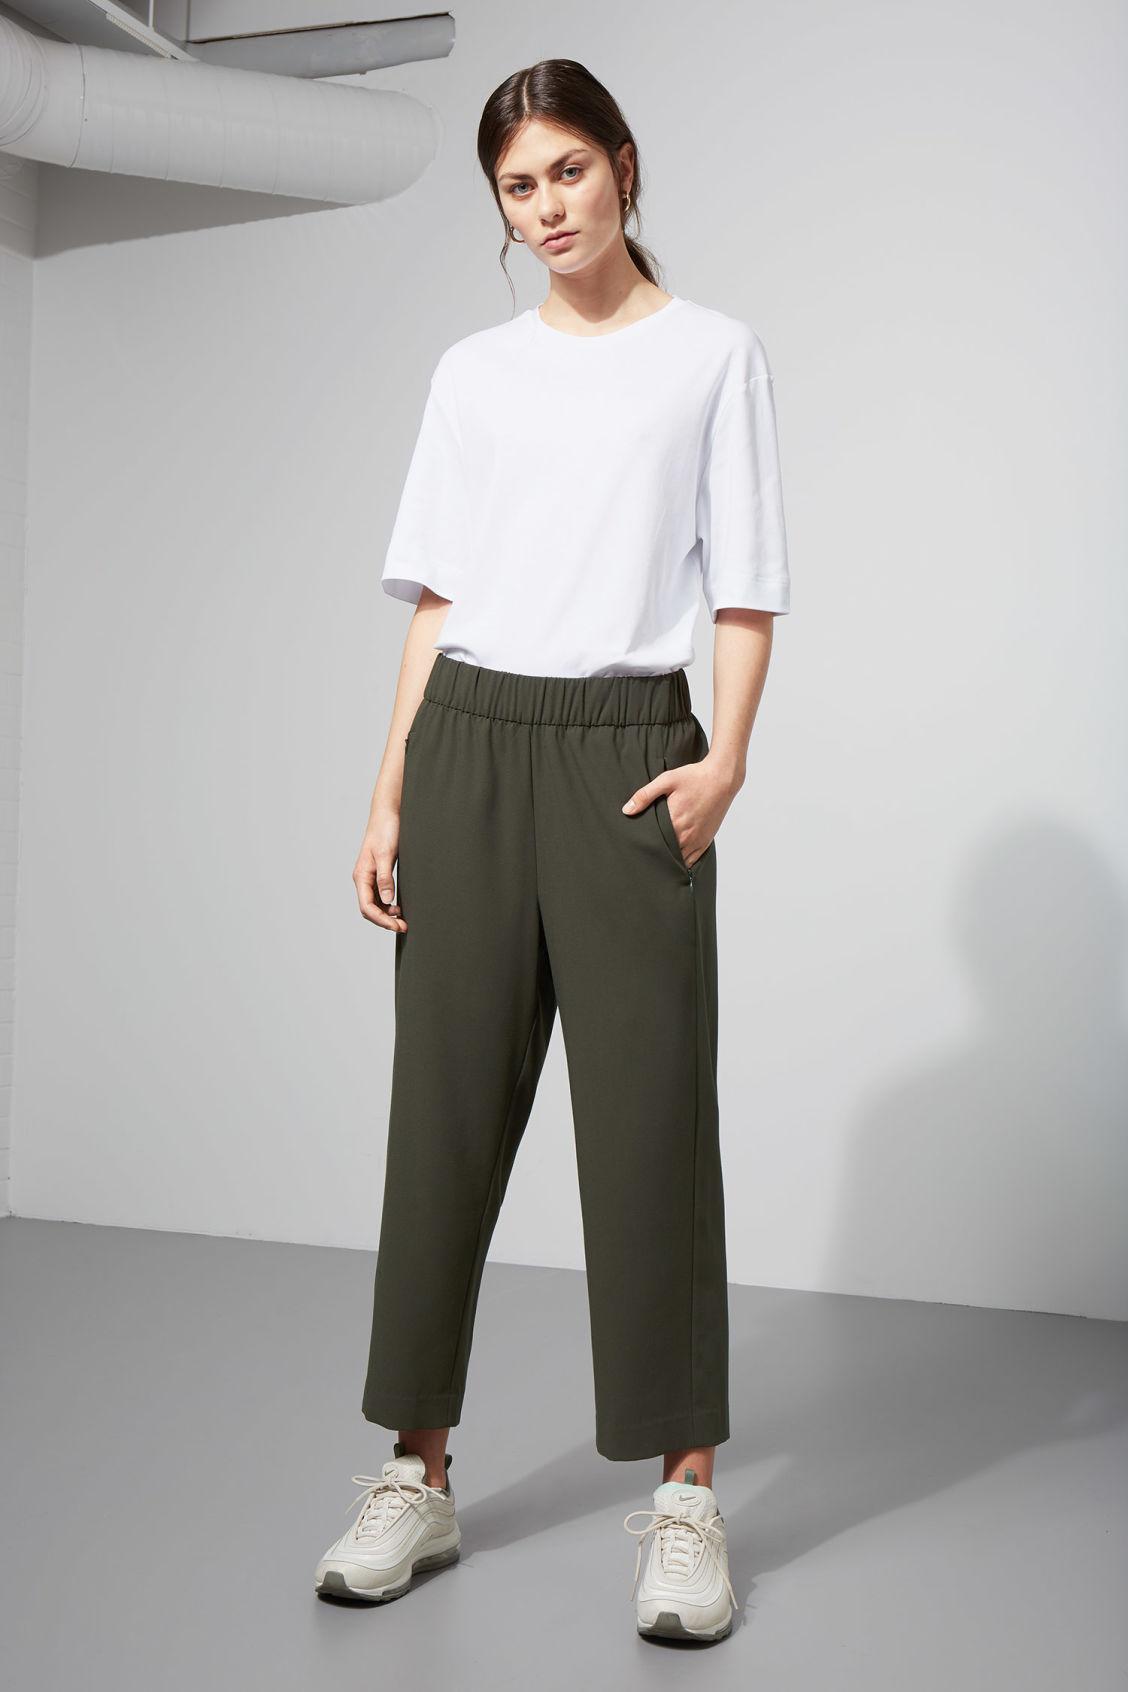 Weekday Amelia Woven Trousers - Green Avec Paypal Pas Cher En Ligne OCke8hYA